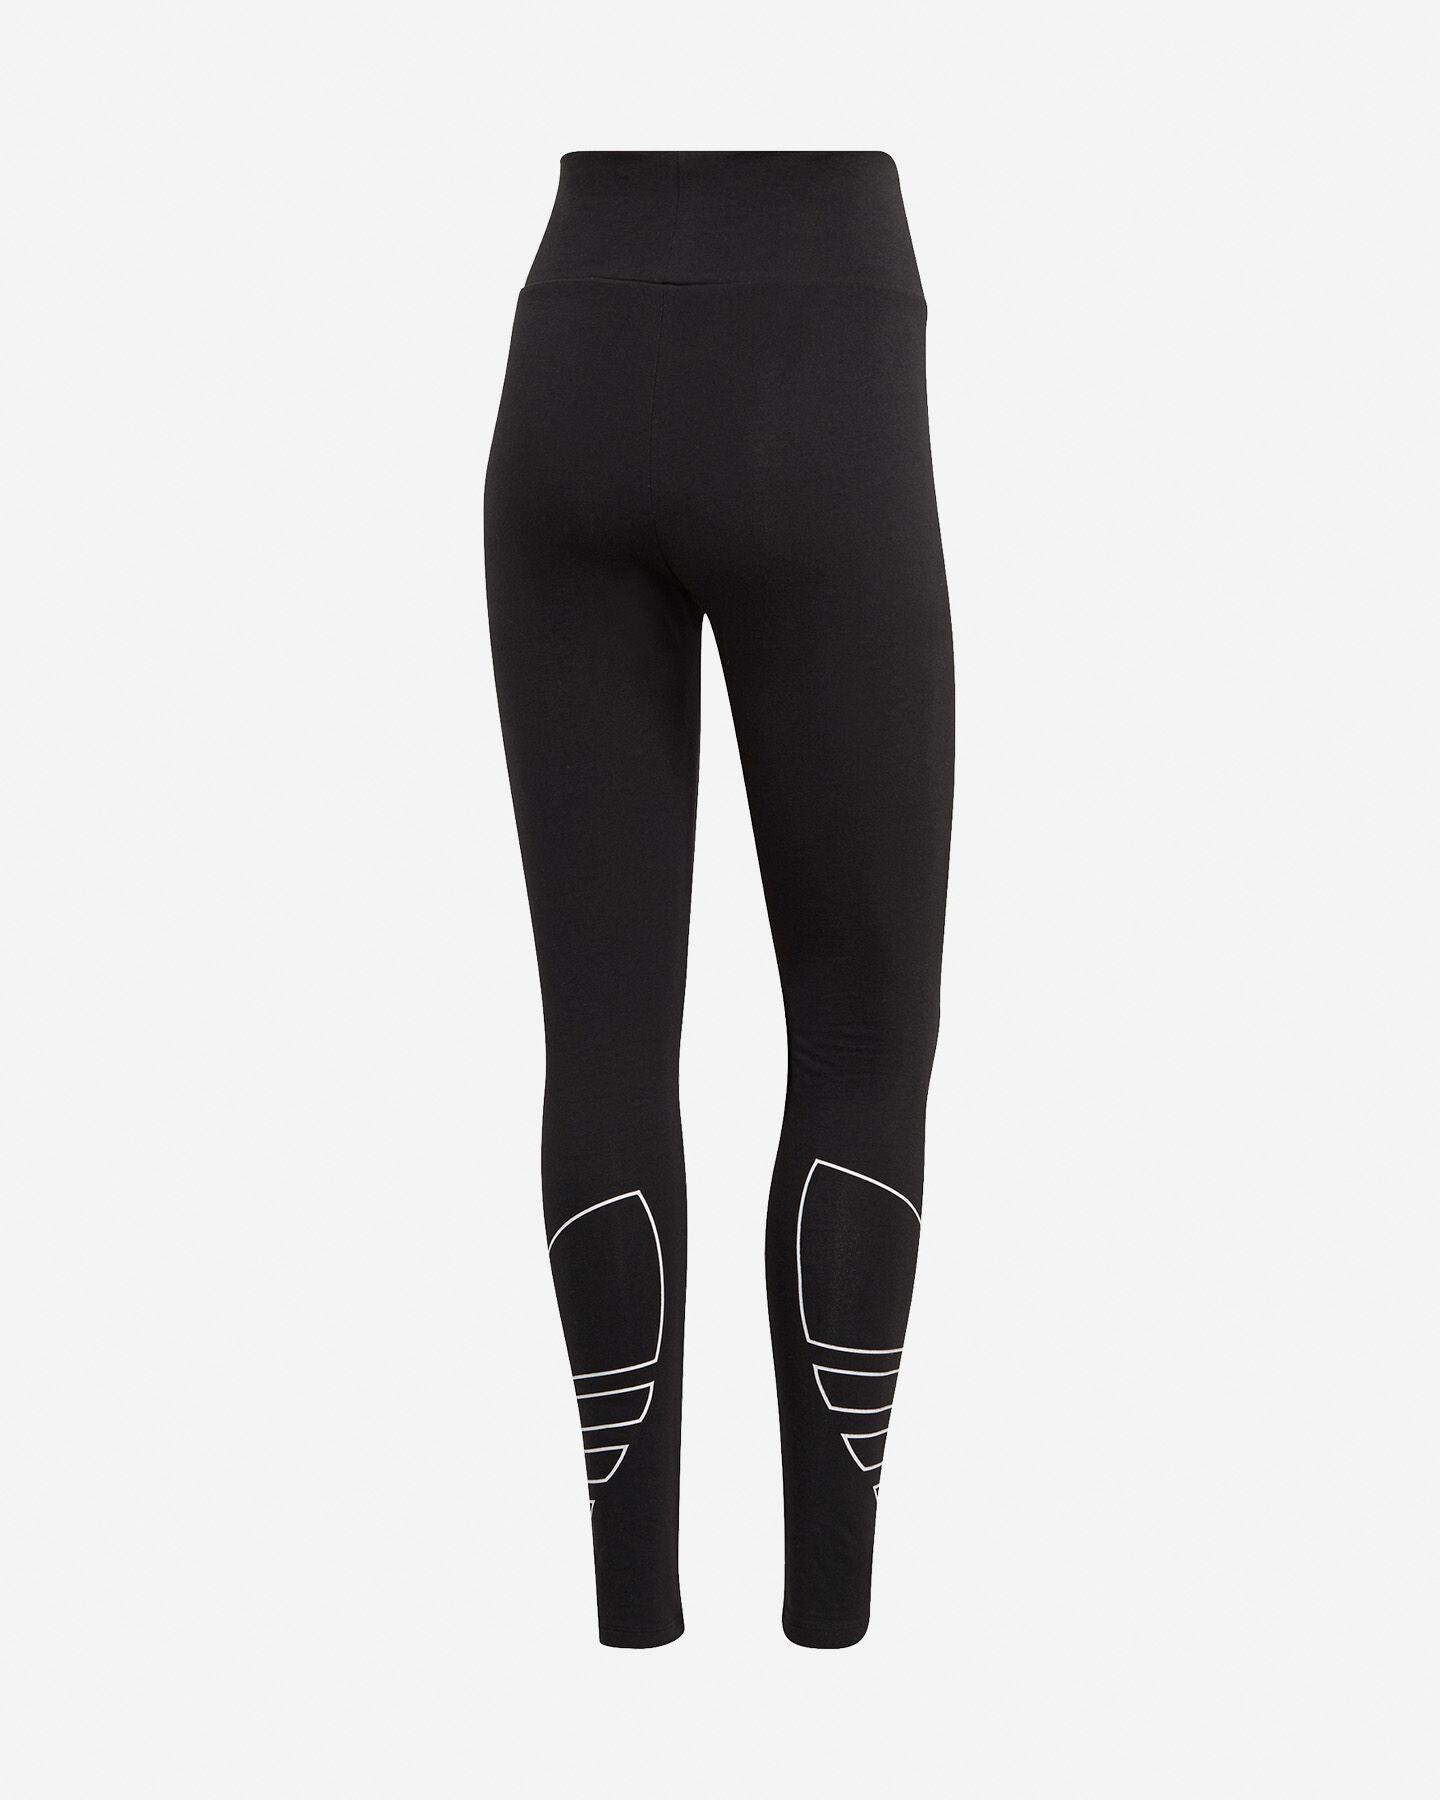 Jeans ADIDAS ORIGINALS BIG TREFOIL W S5210138 scatto 1